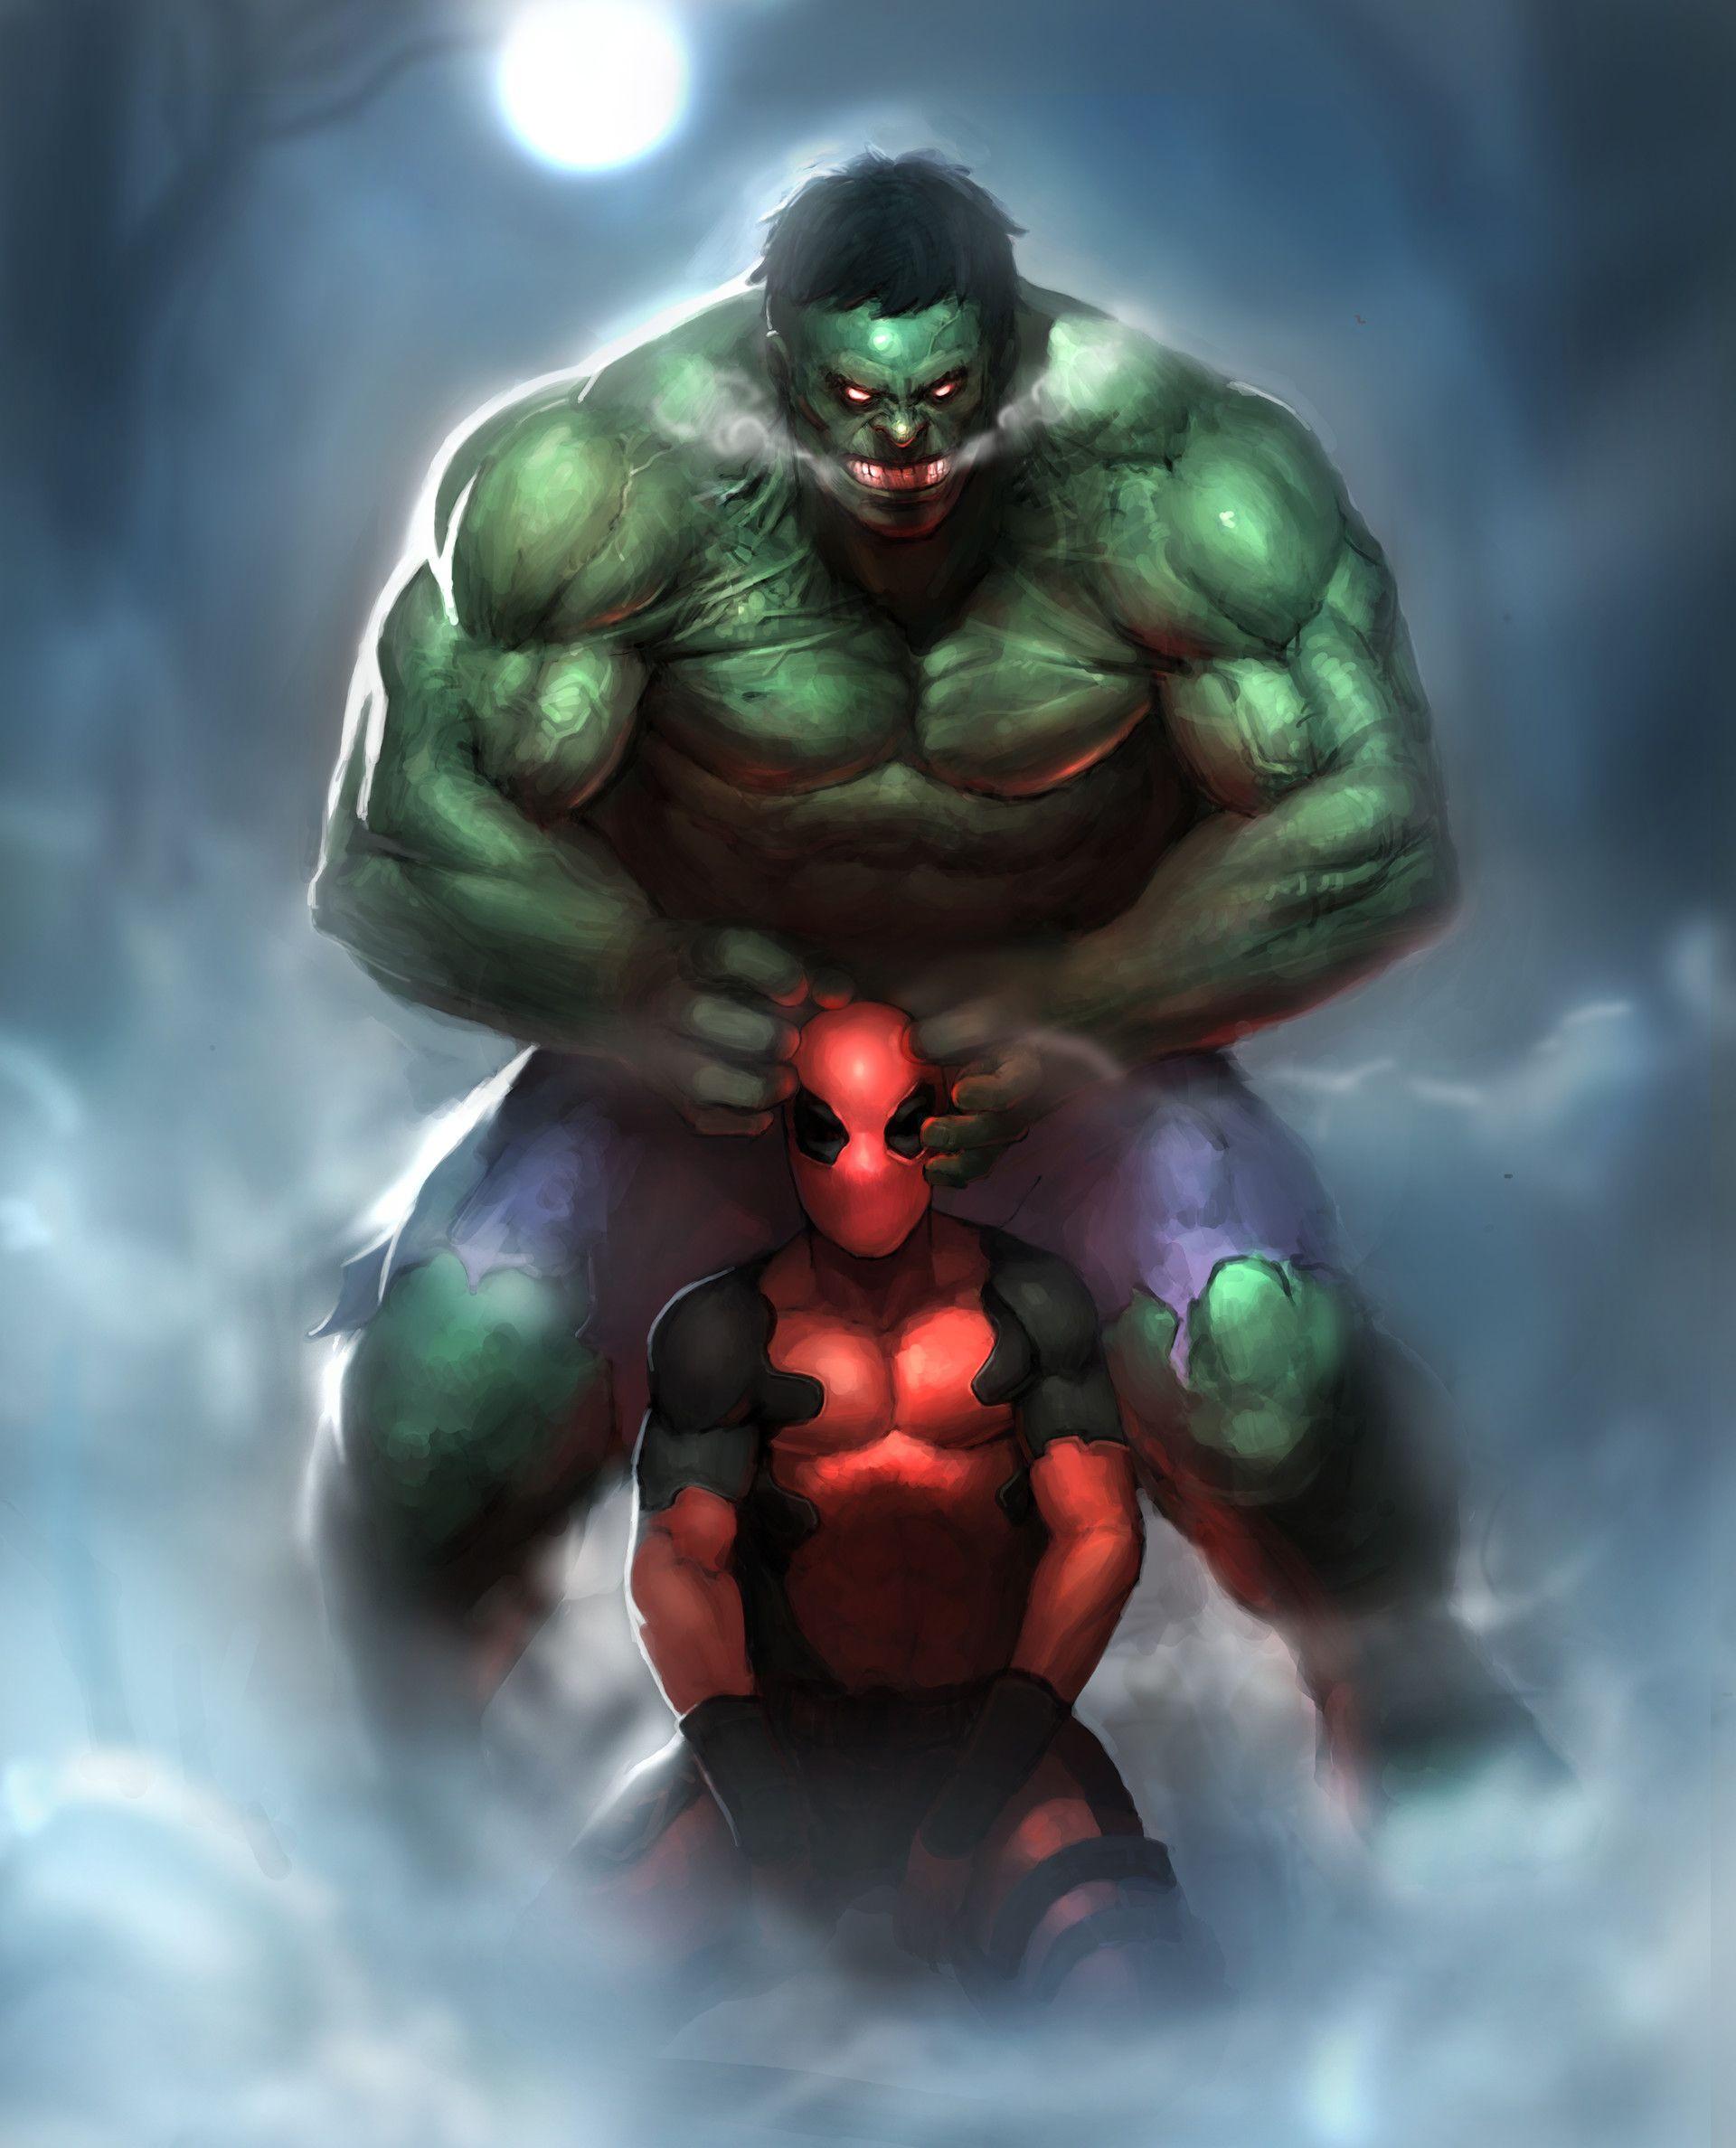 #Hulk #Fan #Art. (Hulk and Deadpool) By: Jeon Wan woong. (THE * 3 * STÅR * ÅWARD OF: AW YEAH, IT'S MAJOR ÅWESOMENESS!!!™)[THANK Ü 4 PINNING!!!<·><]<©>ÅÅÅ+(OB4E)